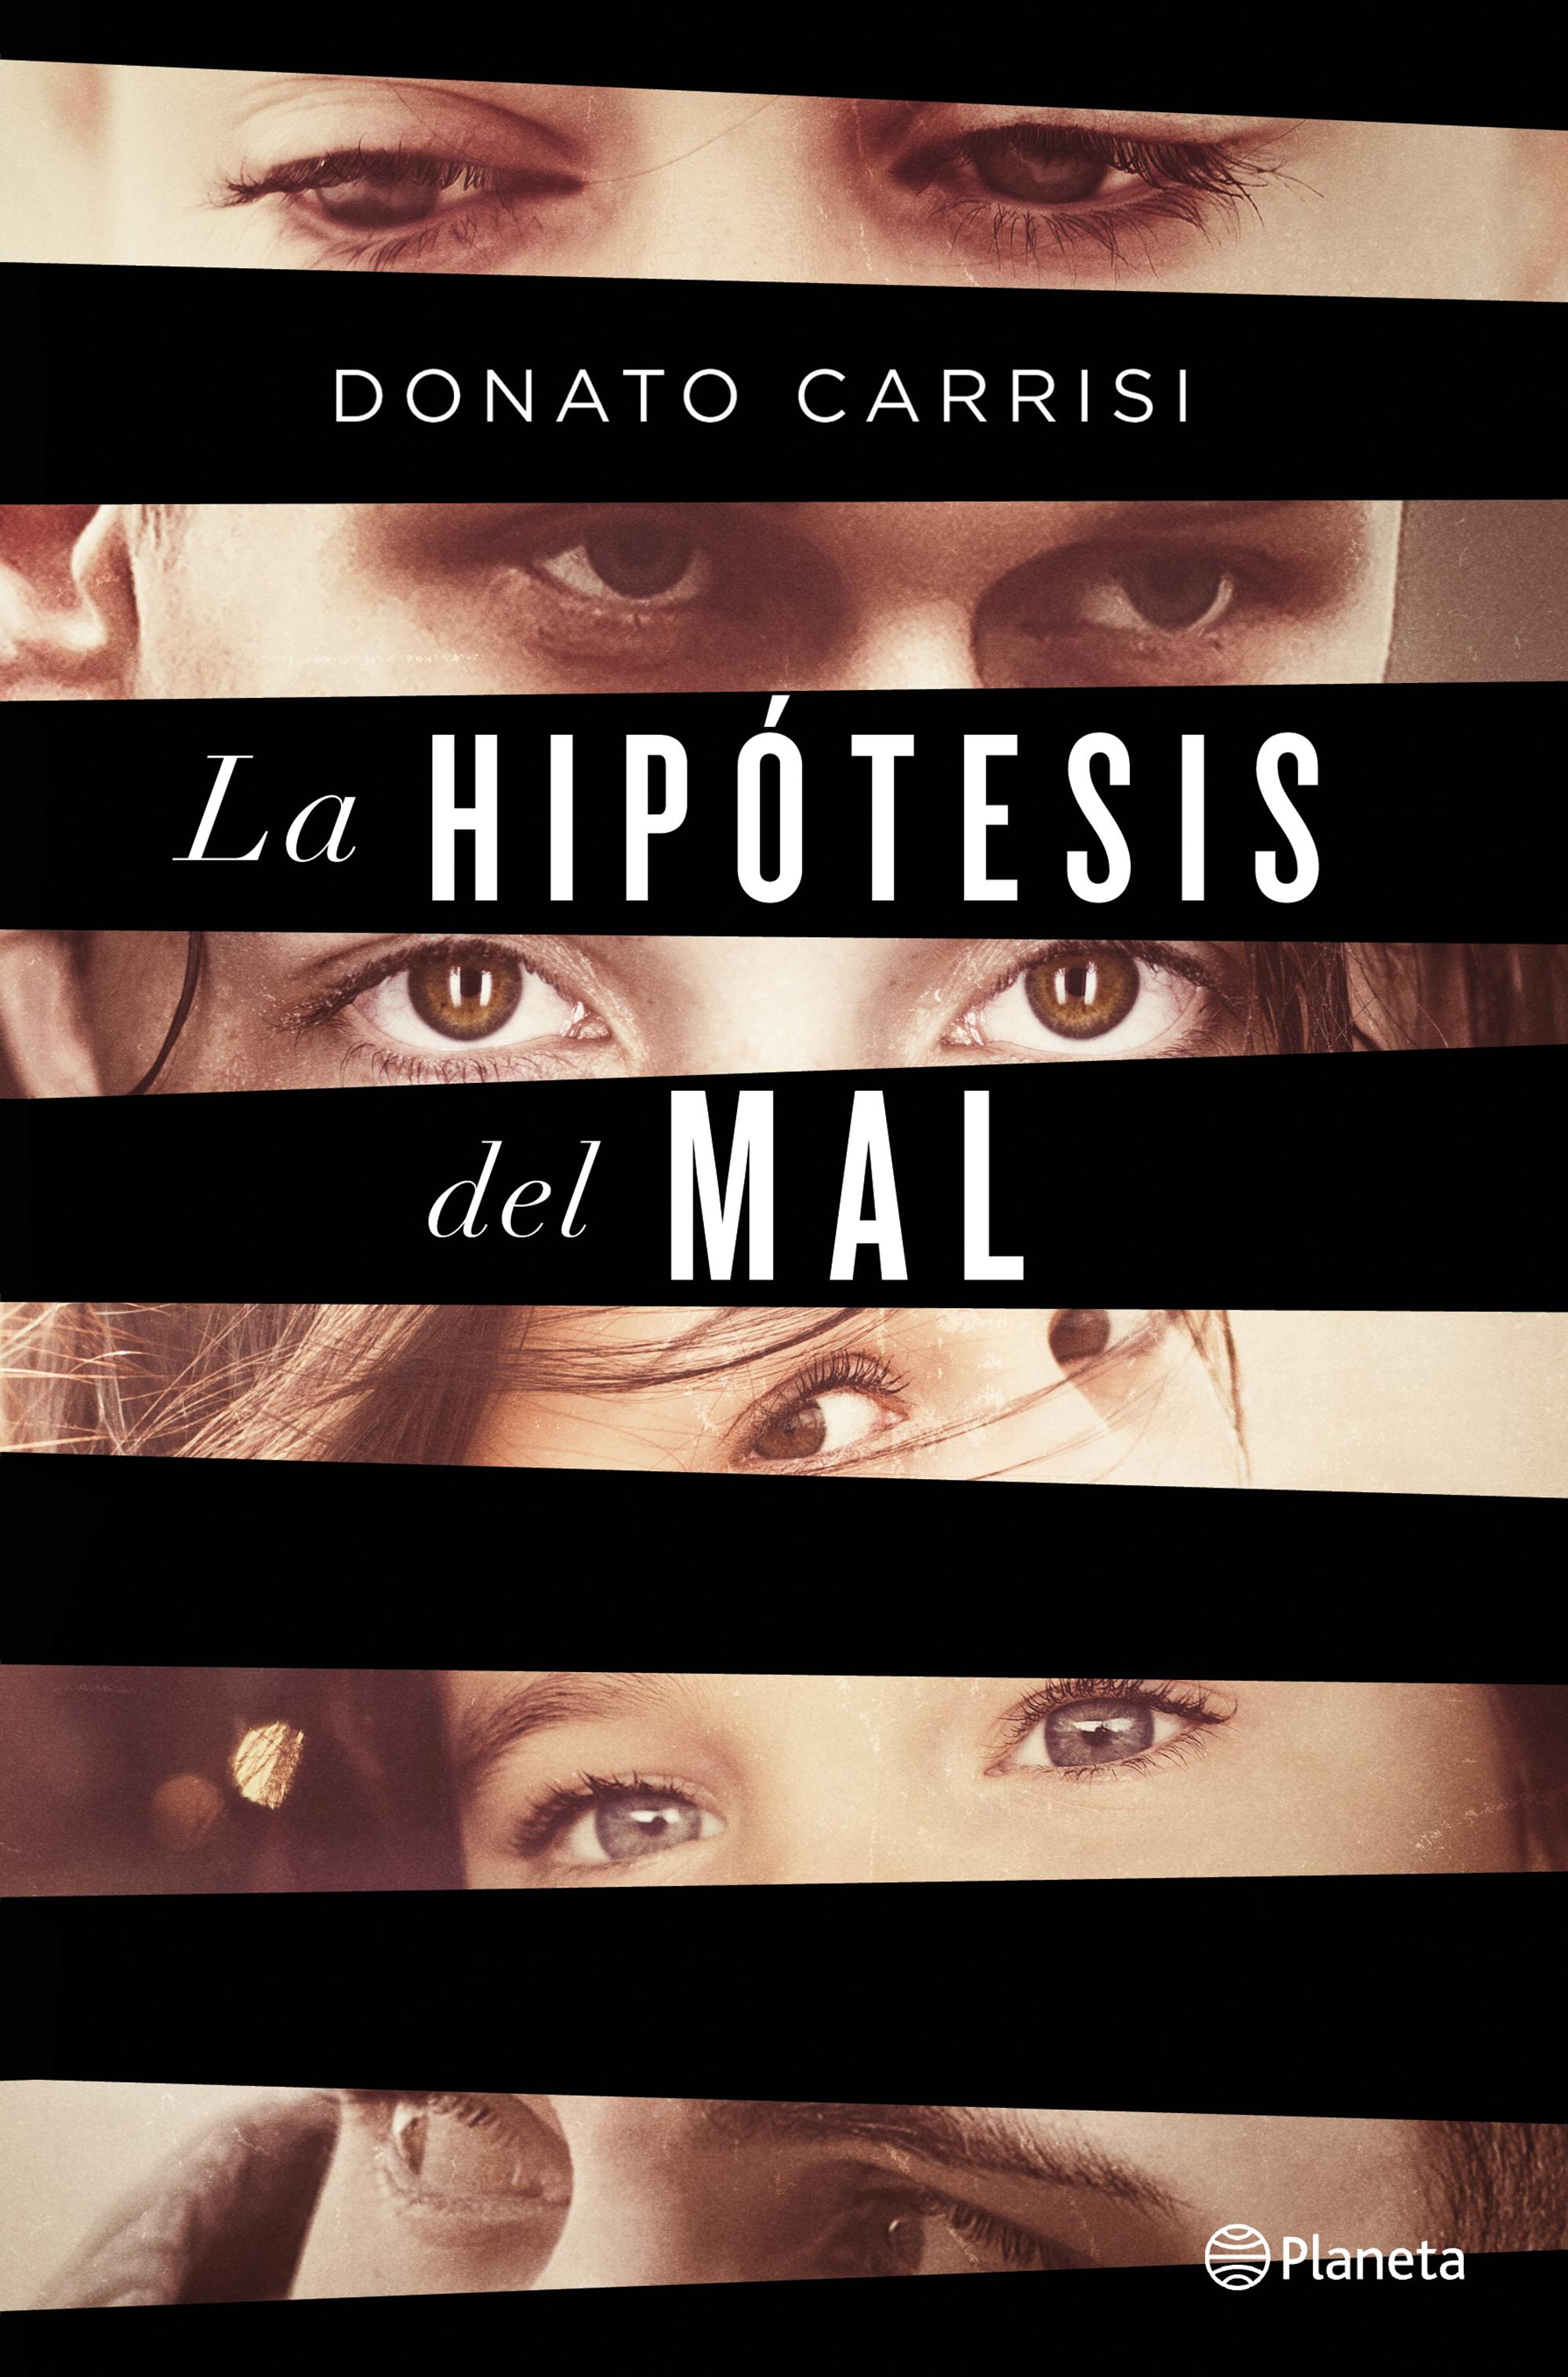 La hipótesis del mal,  Mila Vázquez 02 - Donato Carrisi La-hipotesis-del-mal_9788408135869